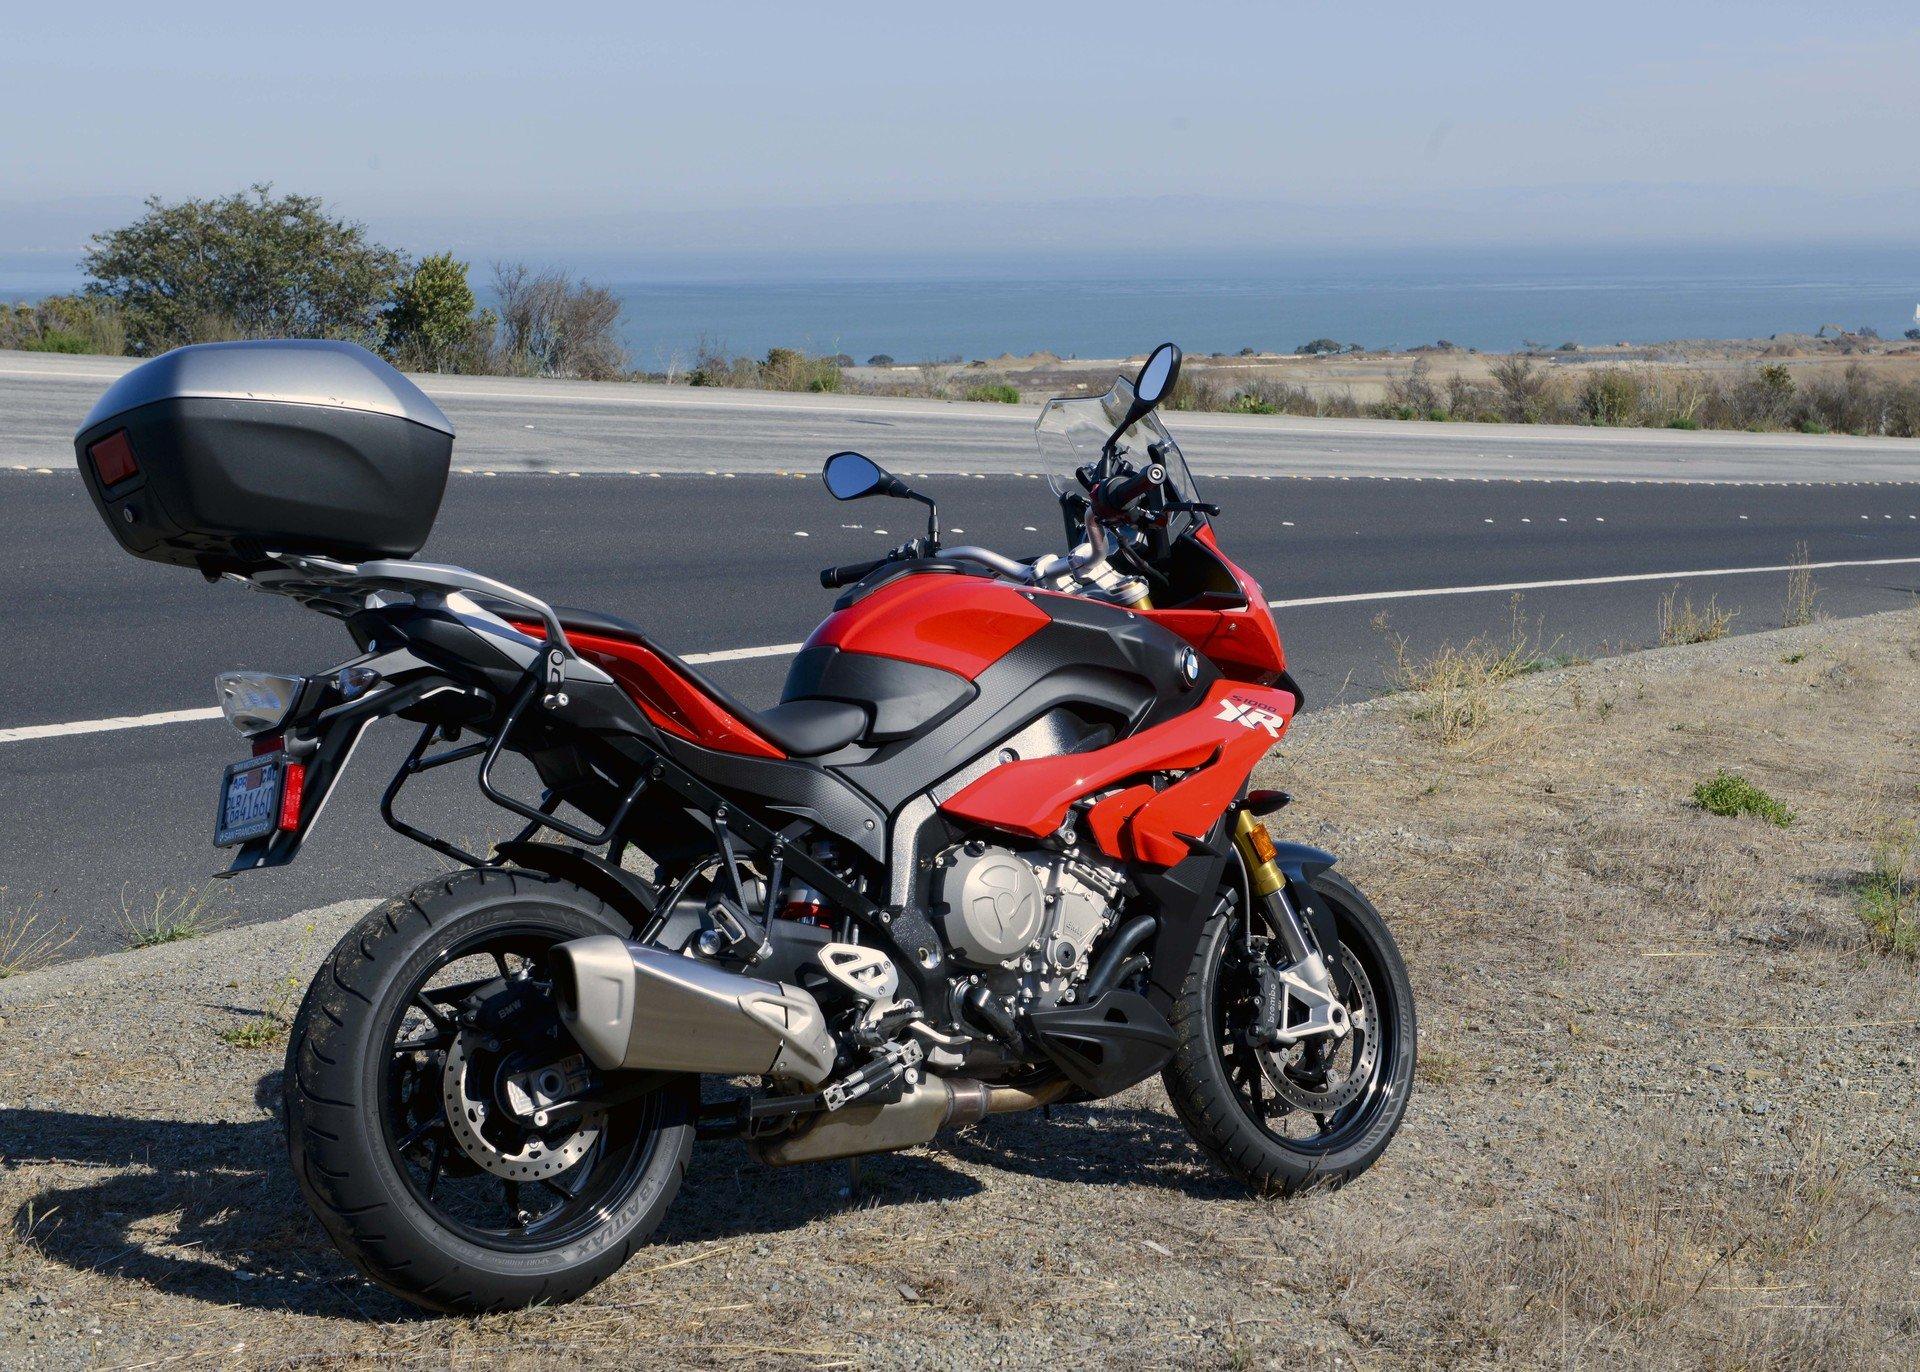 Bmw Motorcycle Rental San Francisco